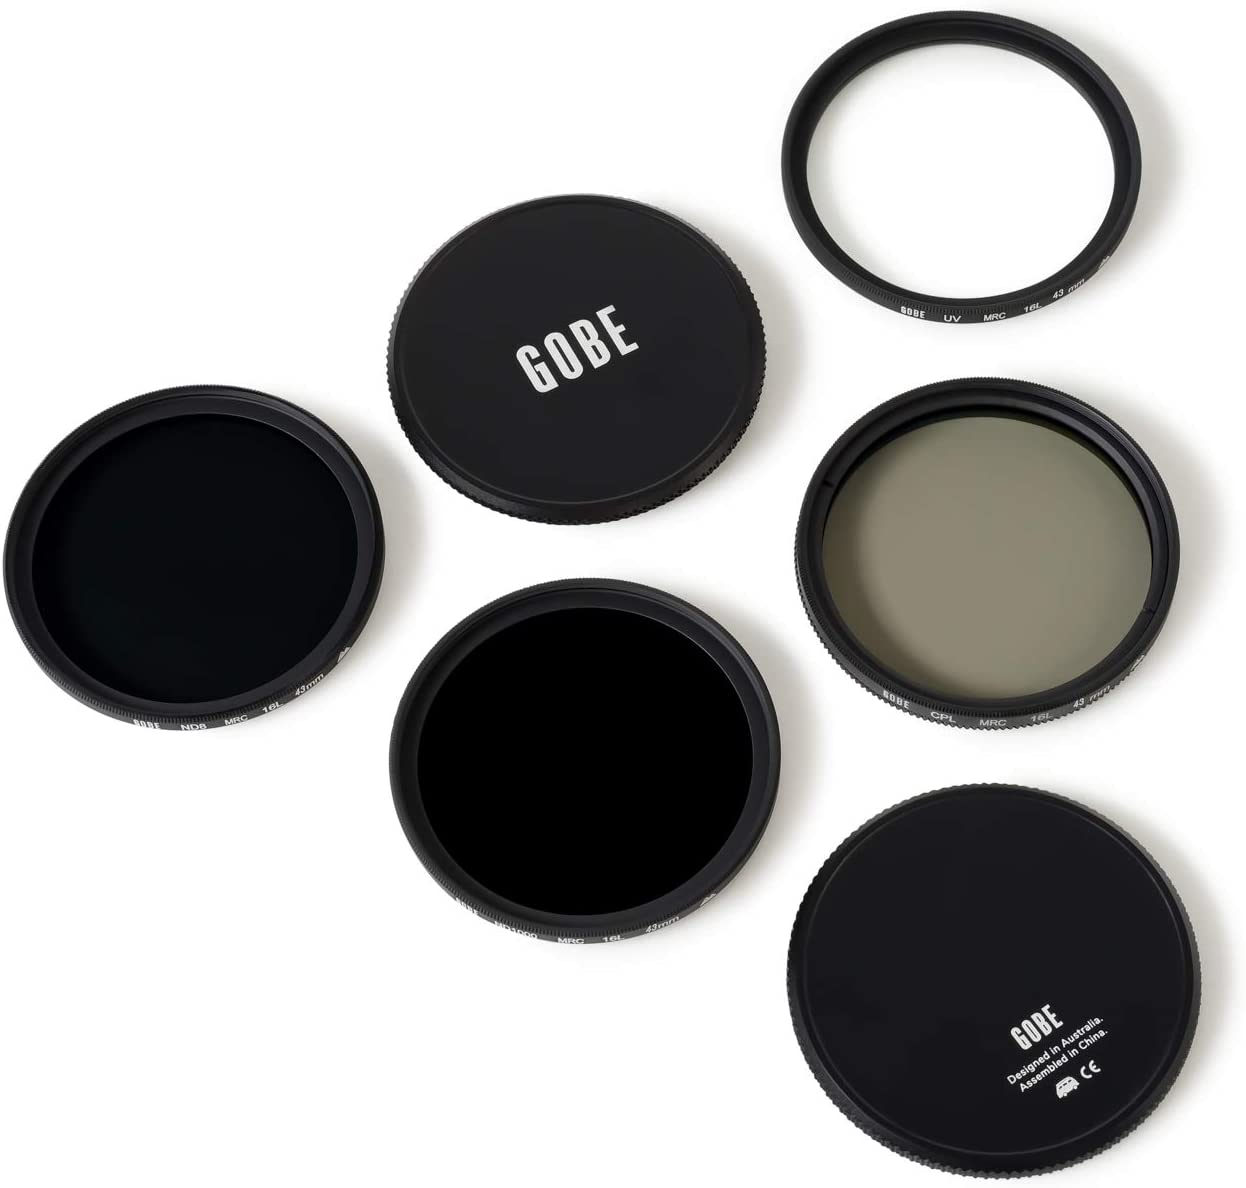 Gobe 37 mm UV Filter Polfilter Graufilter ND8 CPL Graufilter ND1000 Filter Kit 2Peak